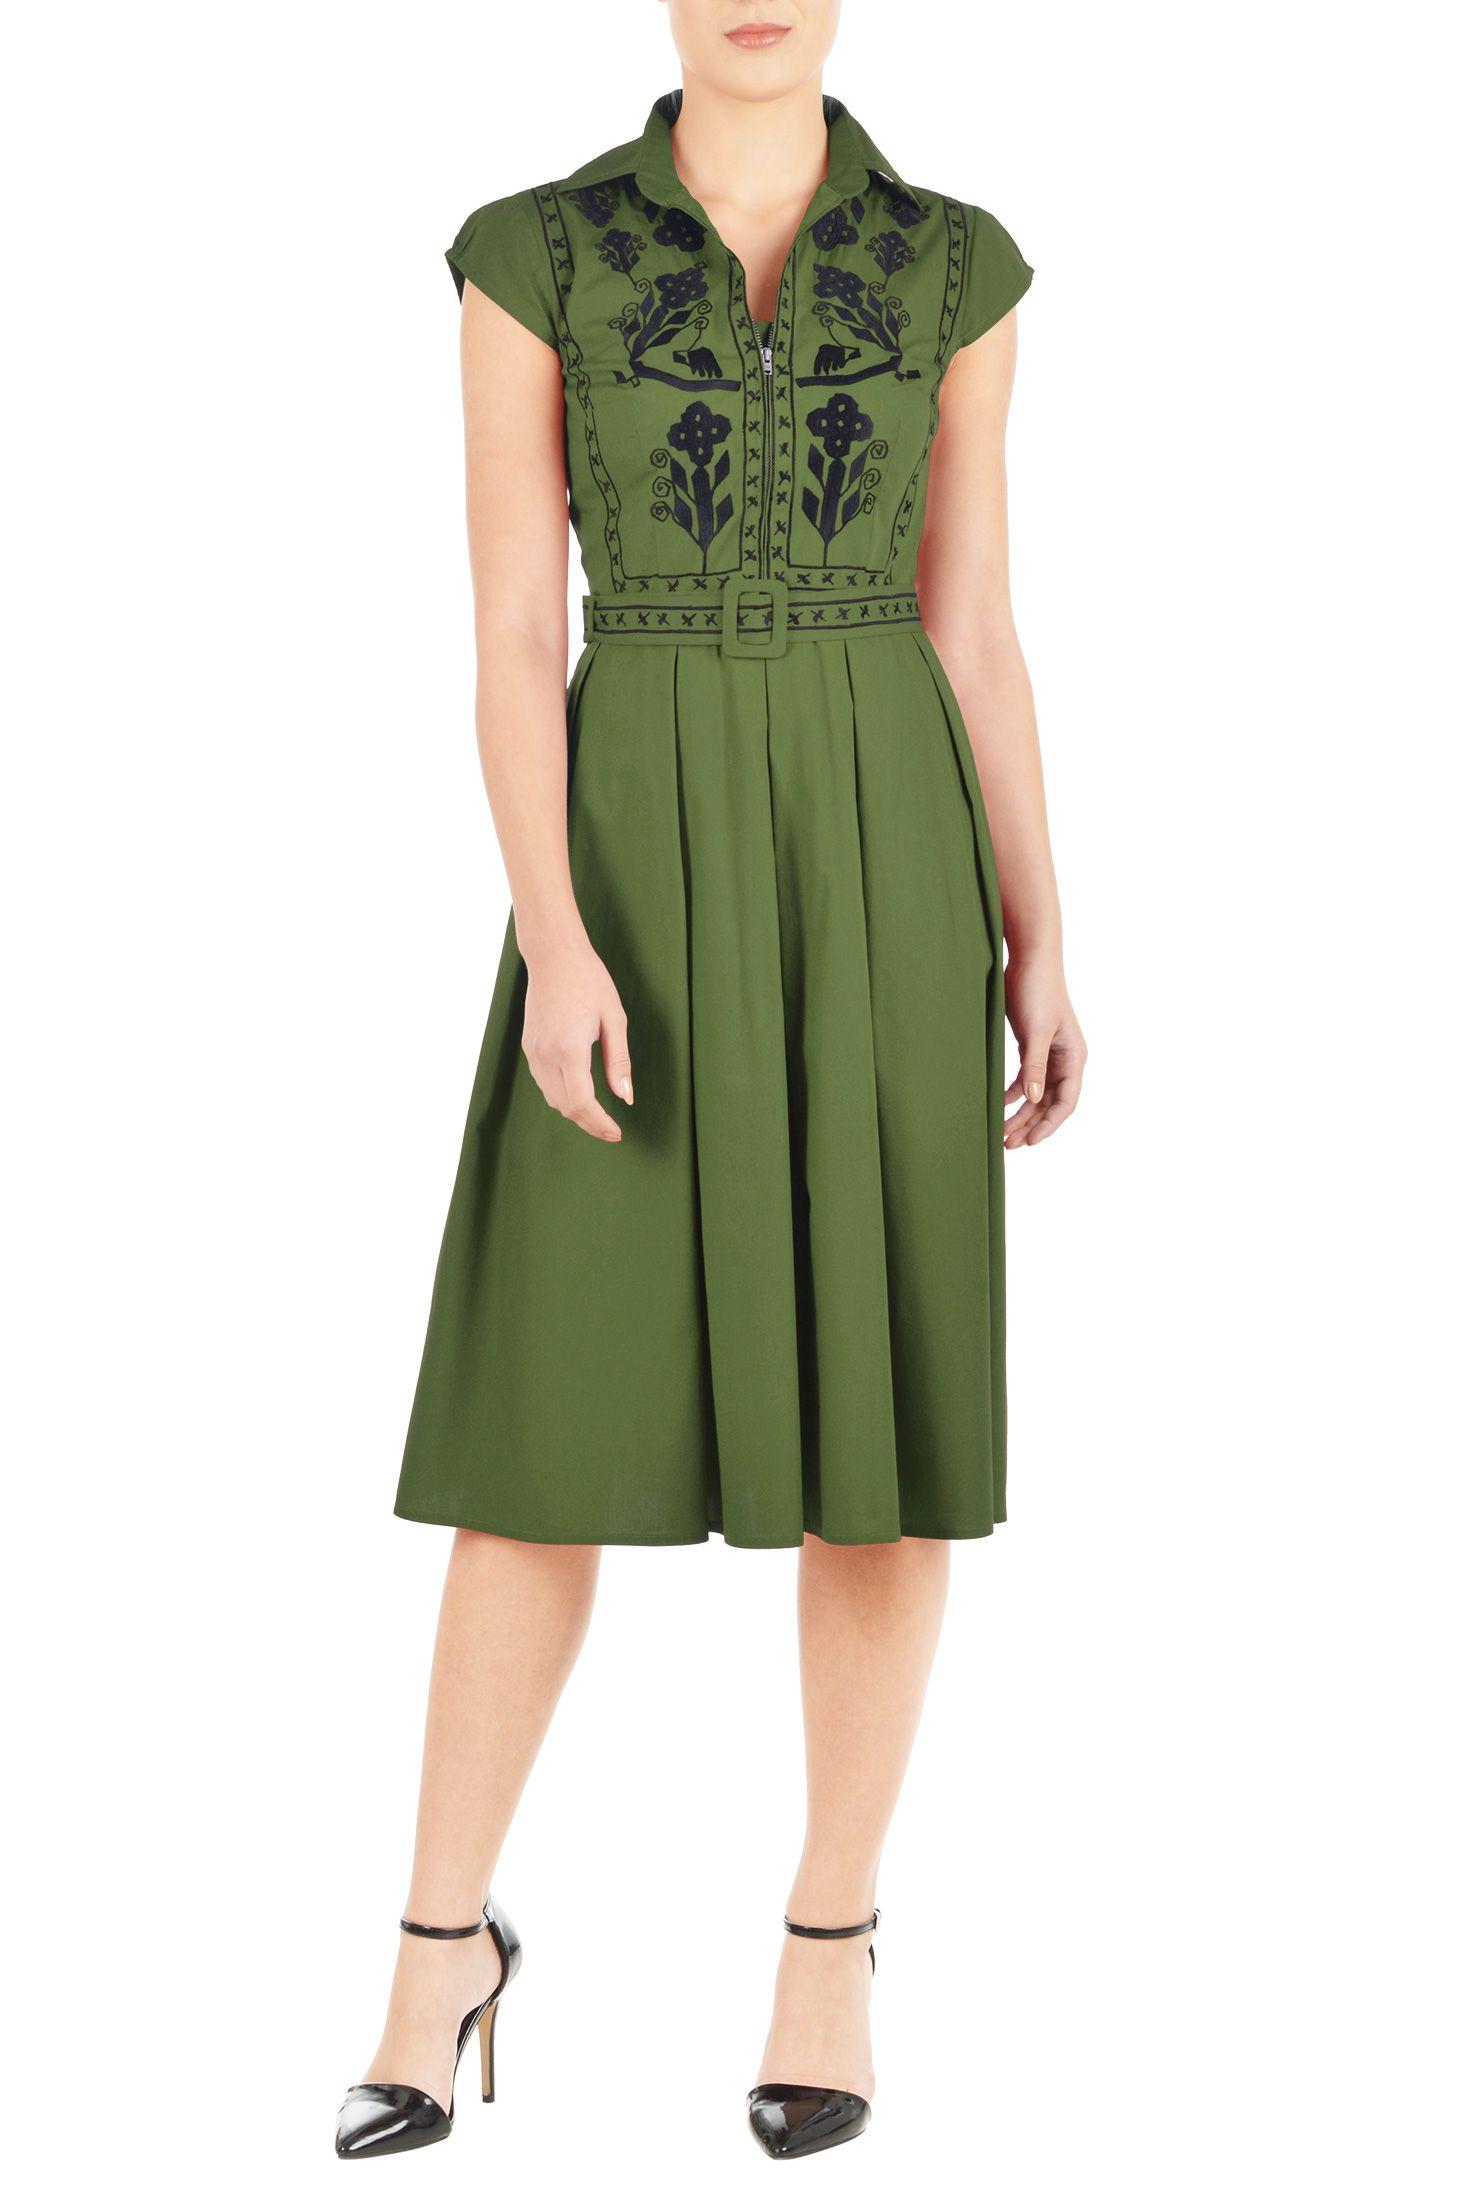 Below knee length dresses cap sleeve dresses collared dresses cot